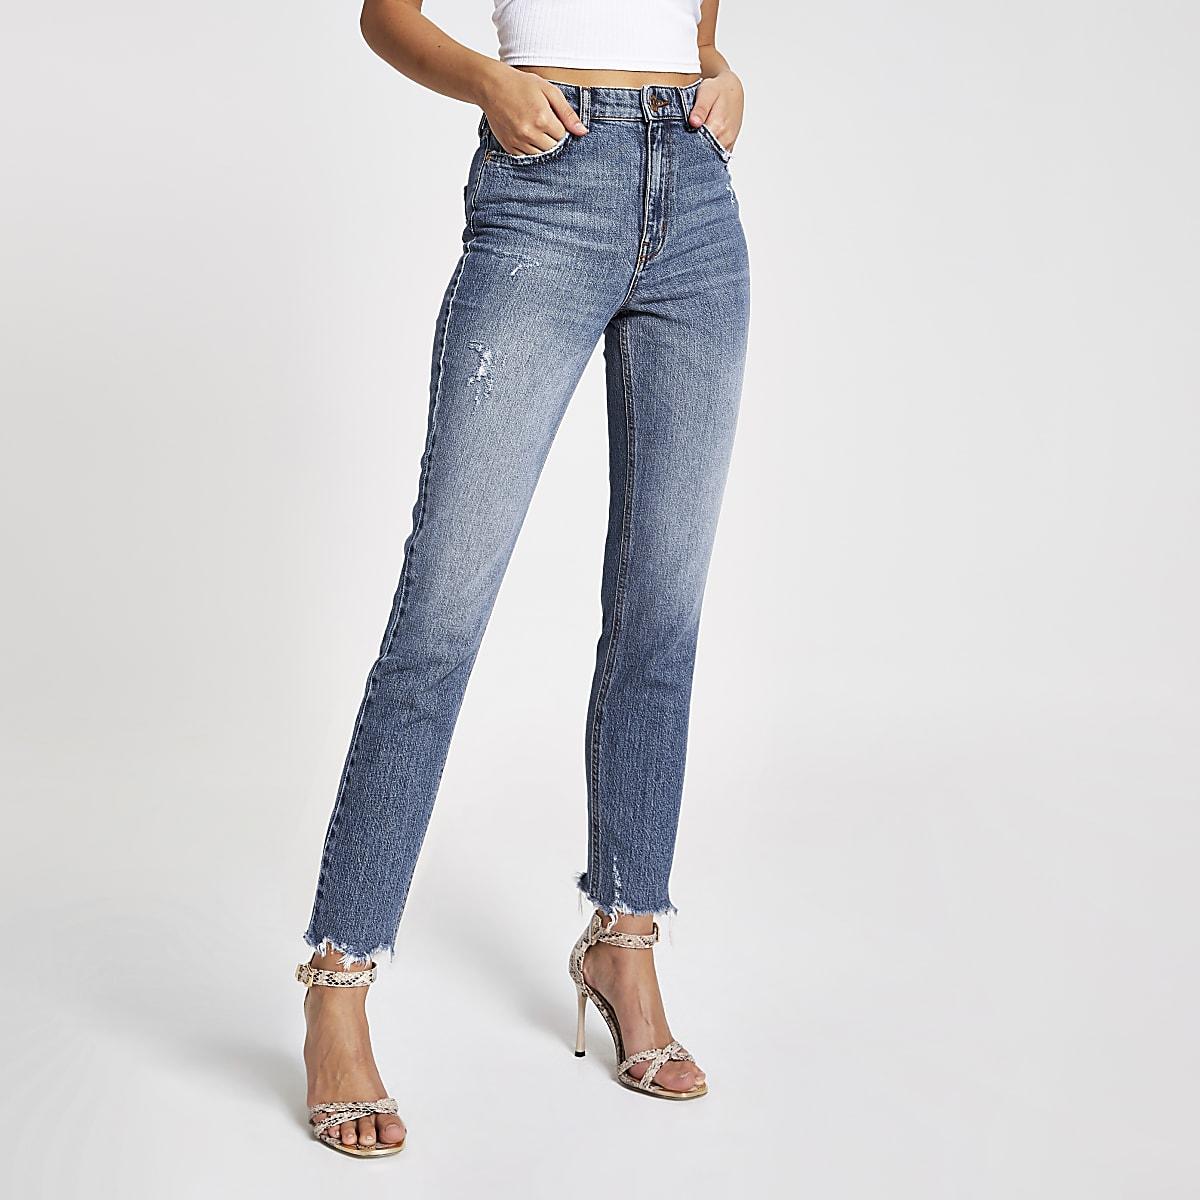 Middenblauwe skinny jeans